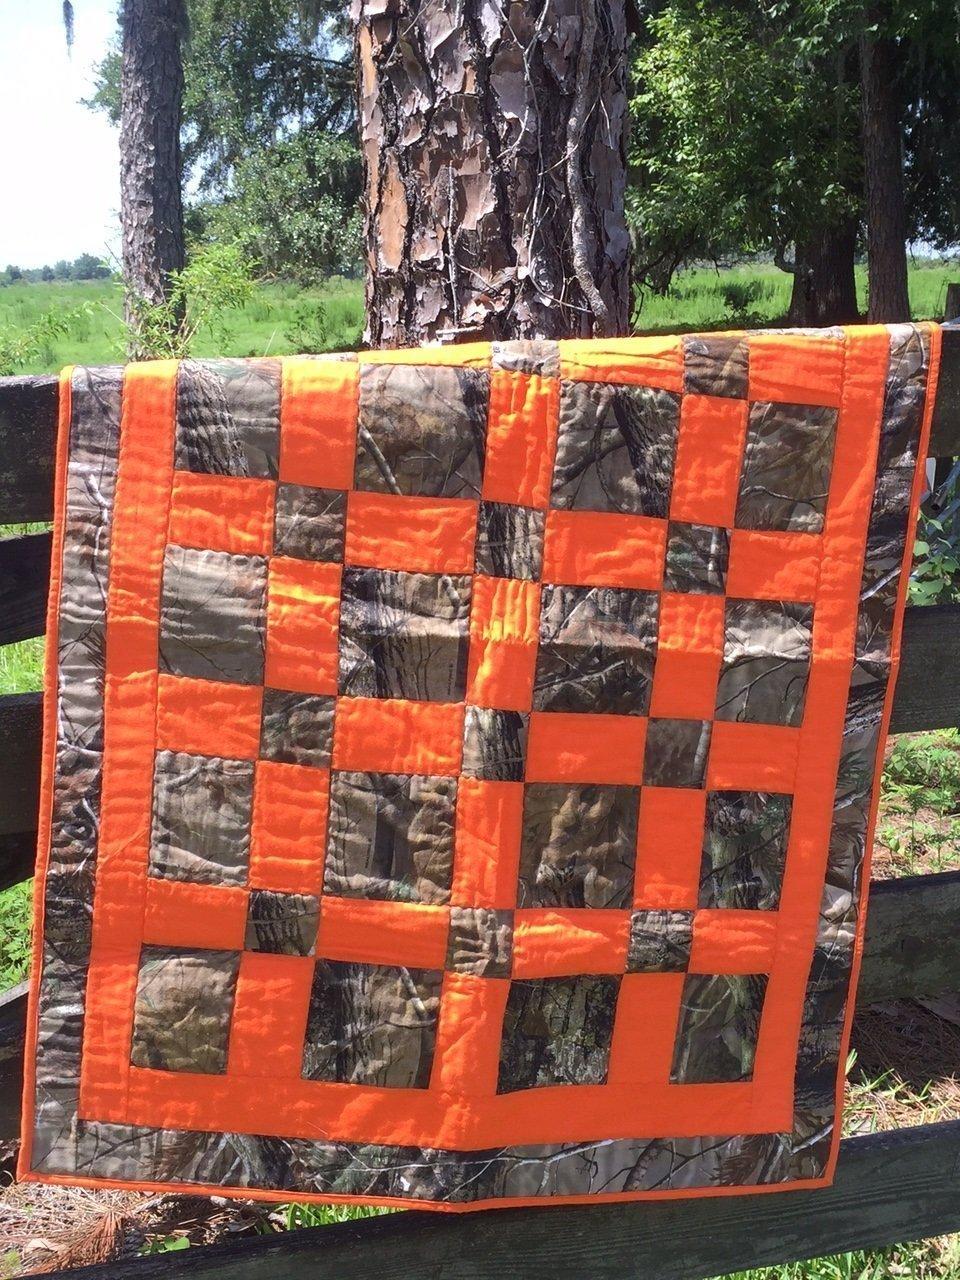 "Nursery Bedding Real Tree Camo & Orange Hand Made Baby Quilt 36"" x 50"" Baby Room Decor Crib Blanket"